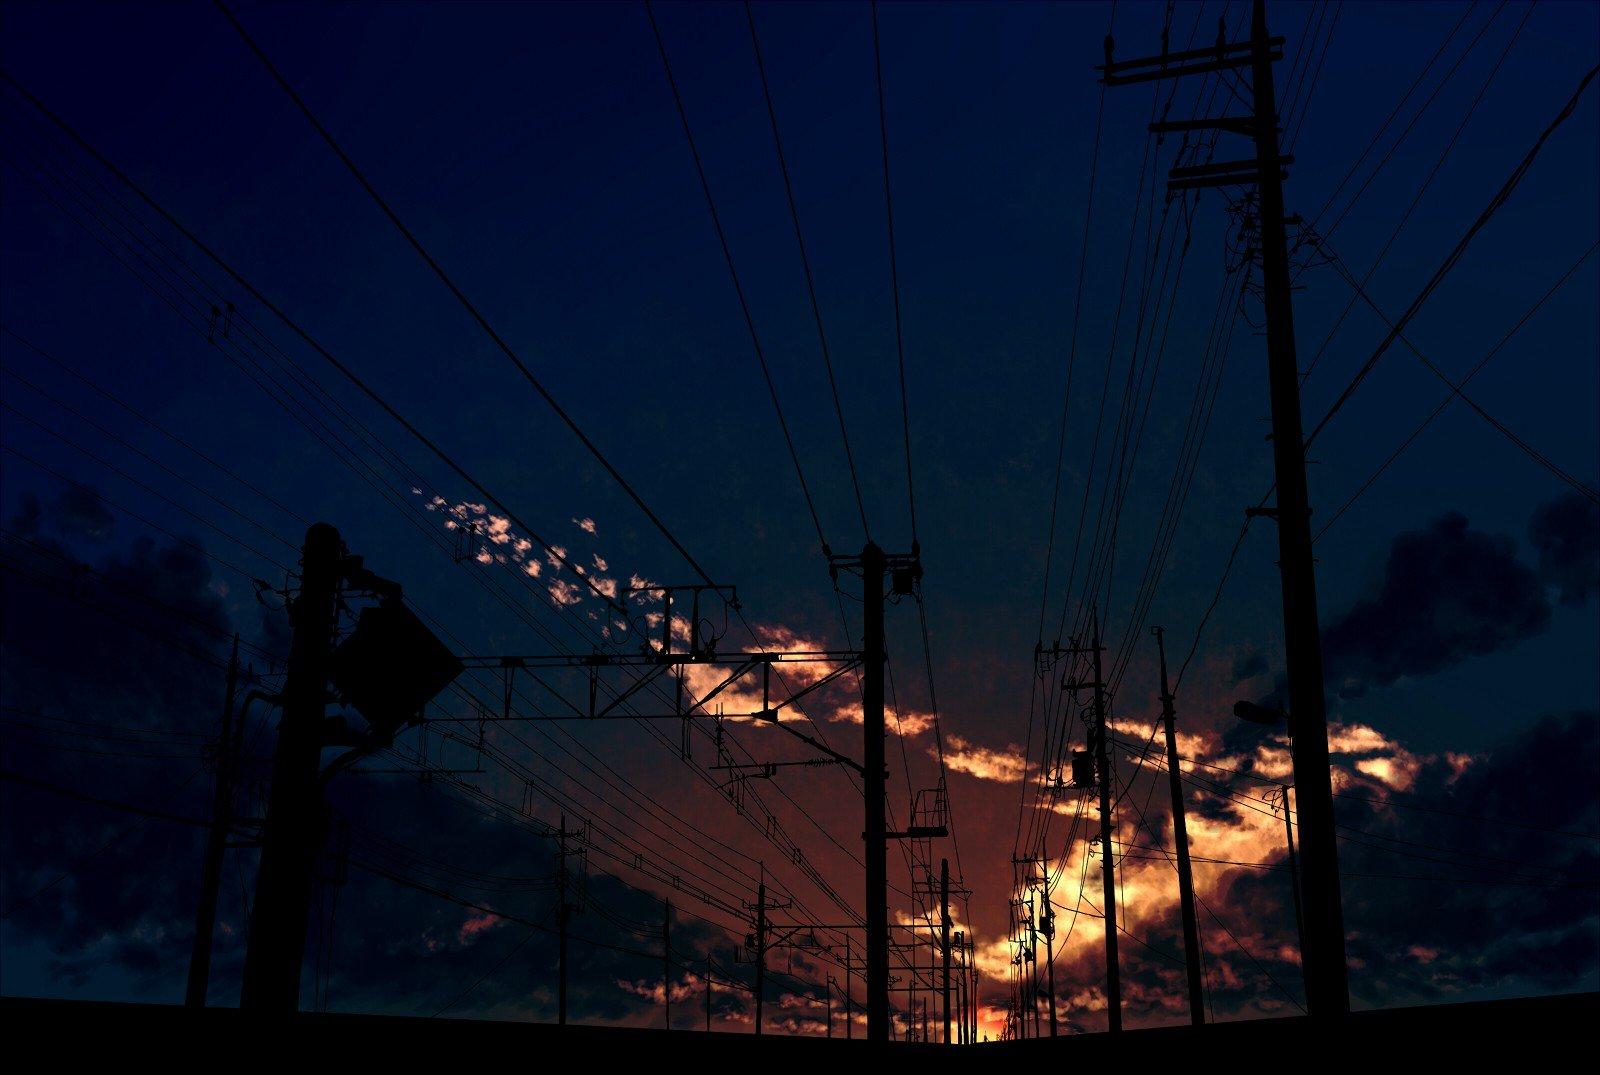 anime, Night, Railway, Clouds Wallpaper